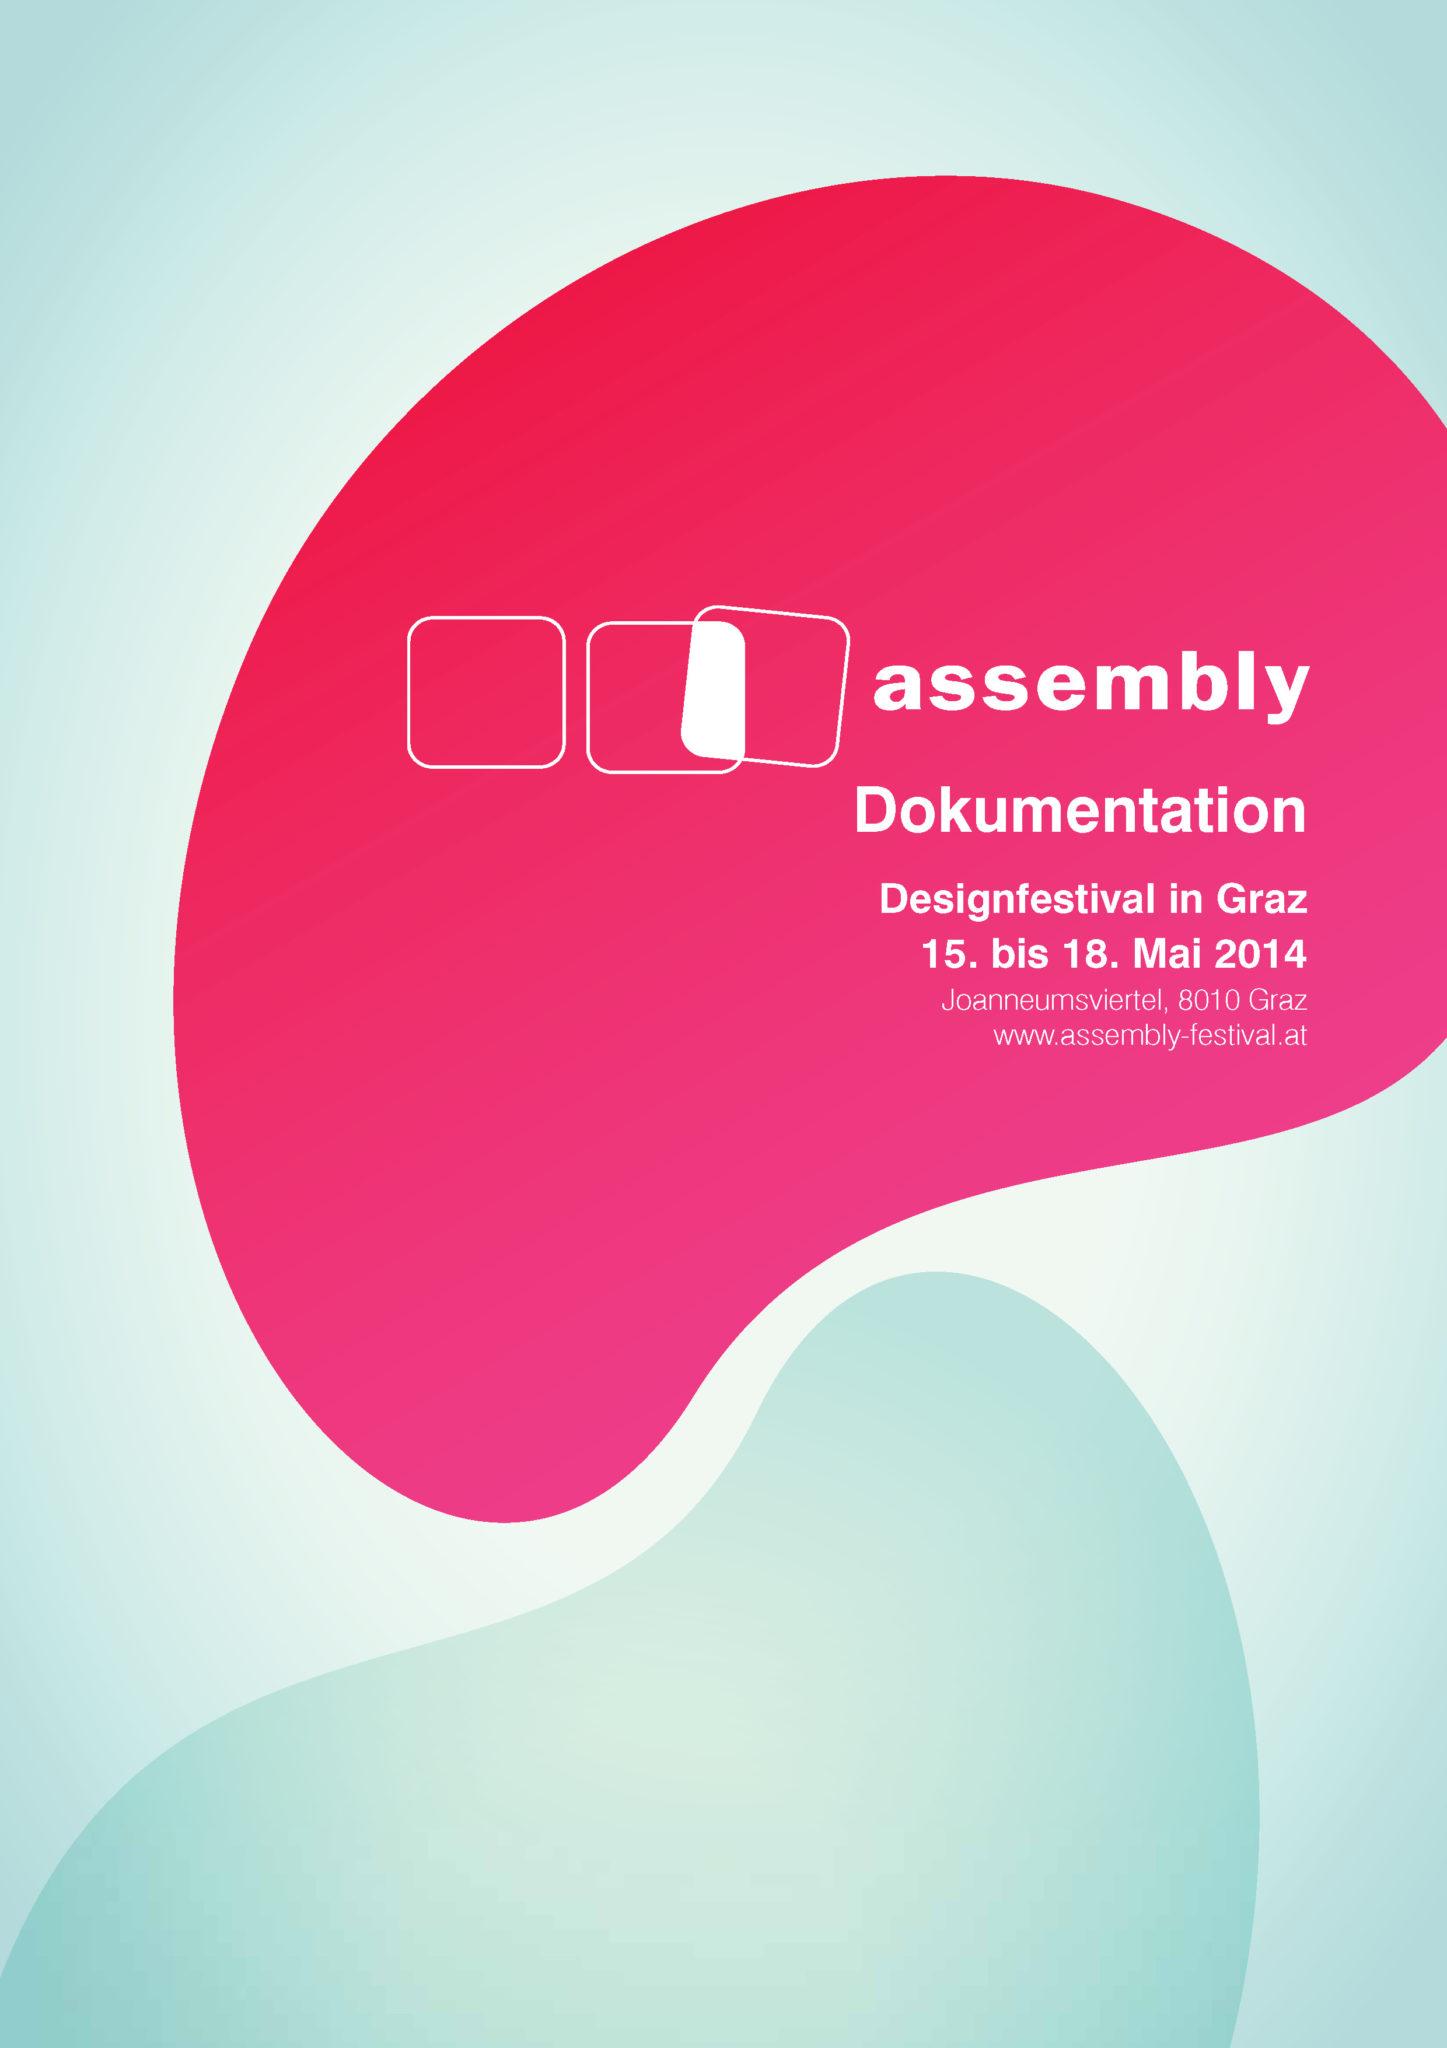 assembly Festival Archive 2014